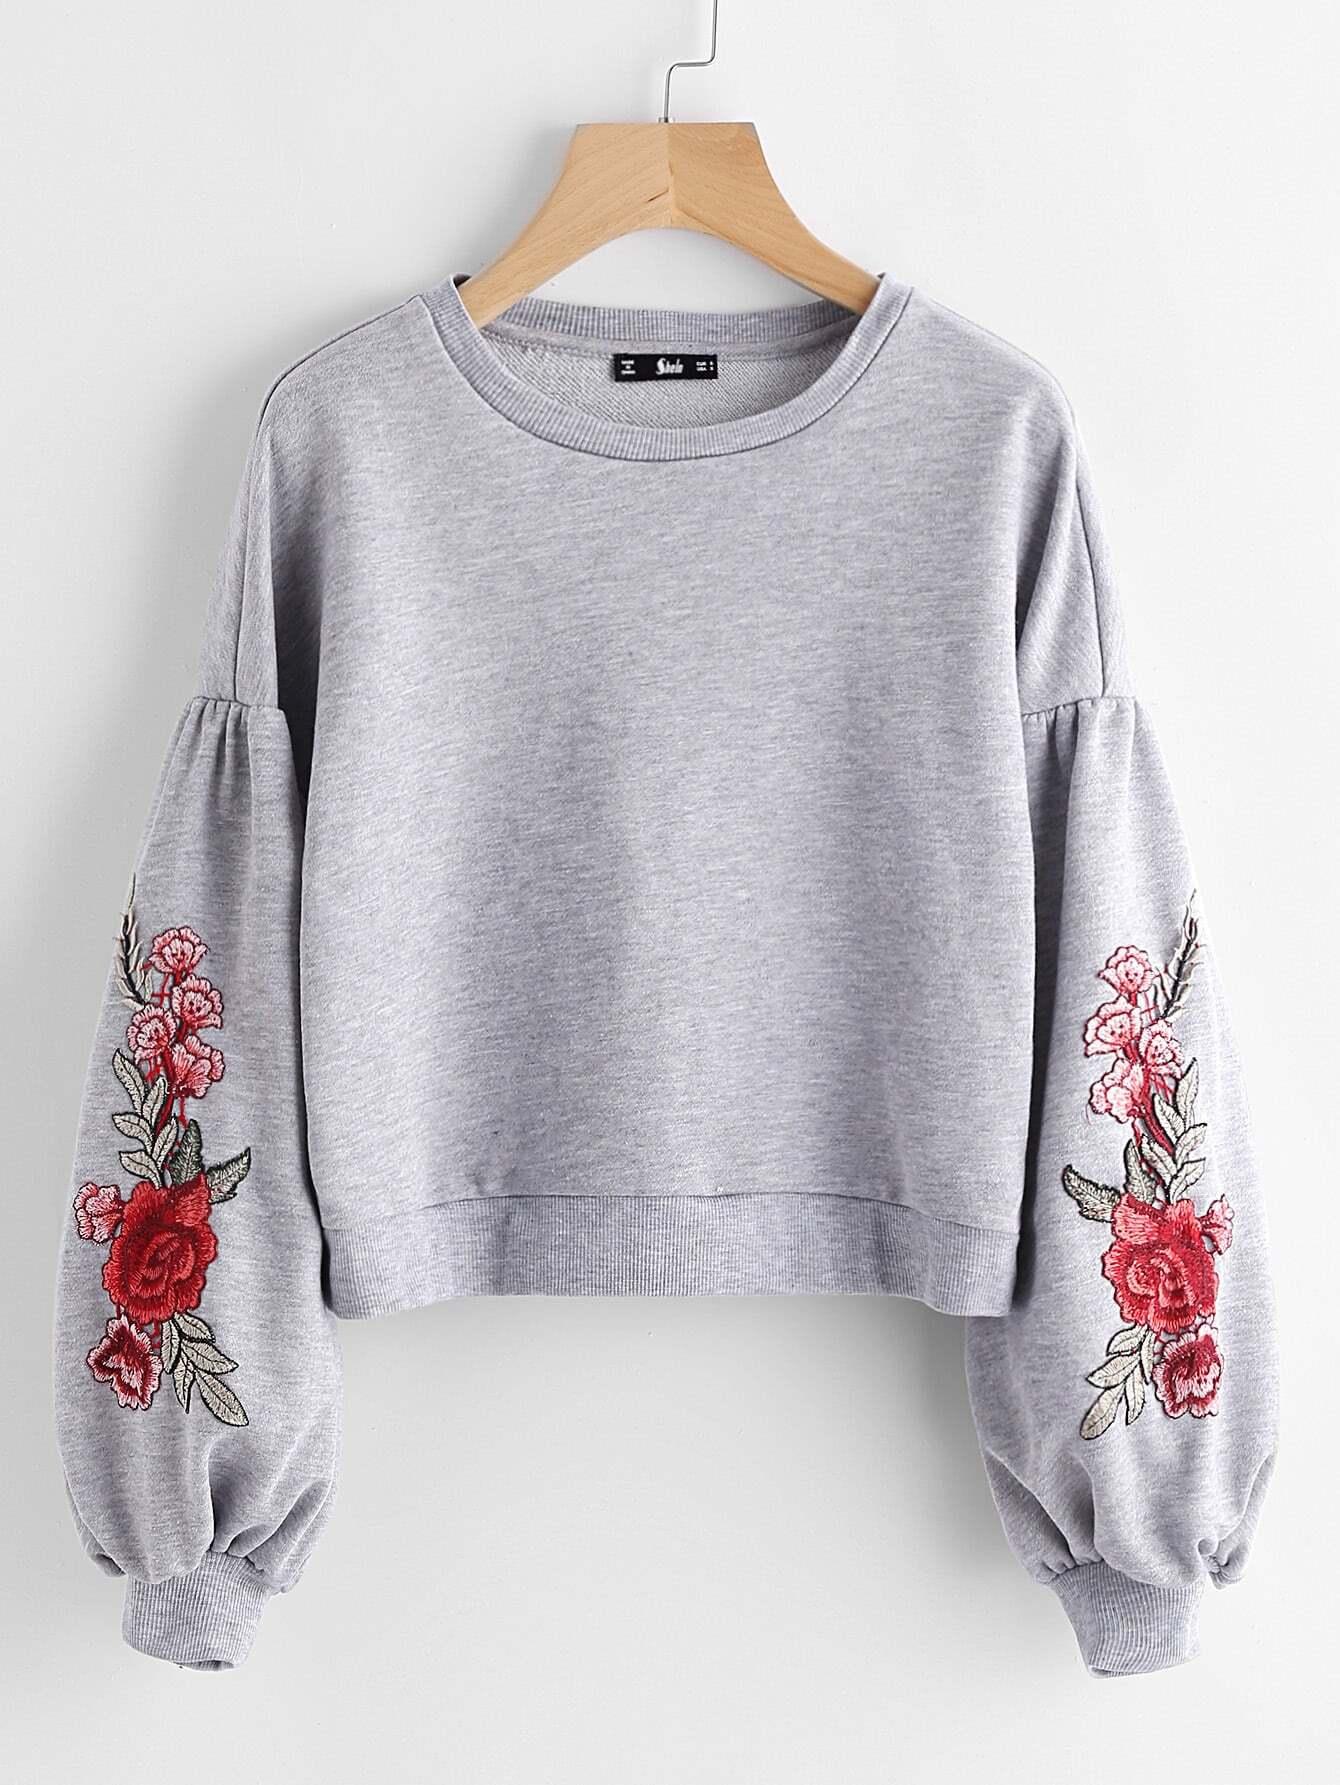 Embroidered Flower Patch Lantern Sleeve Heather Knit Sweatshirt drop shoulder lantern sleeve sweatshirt